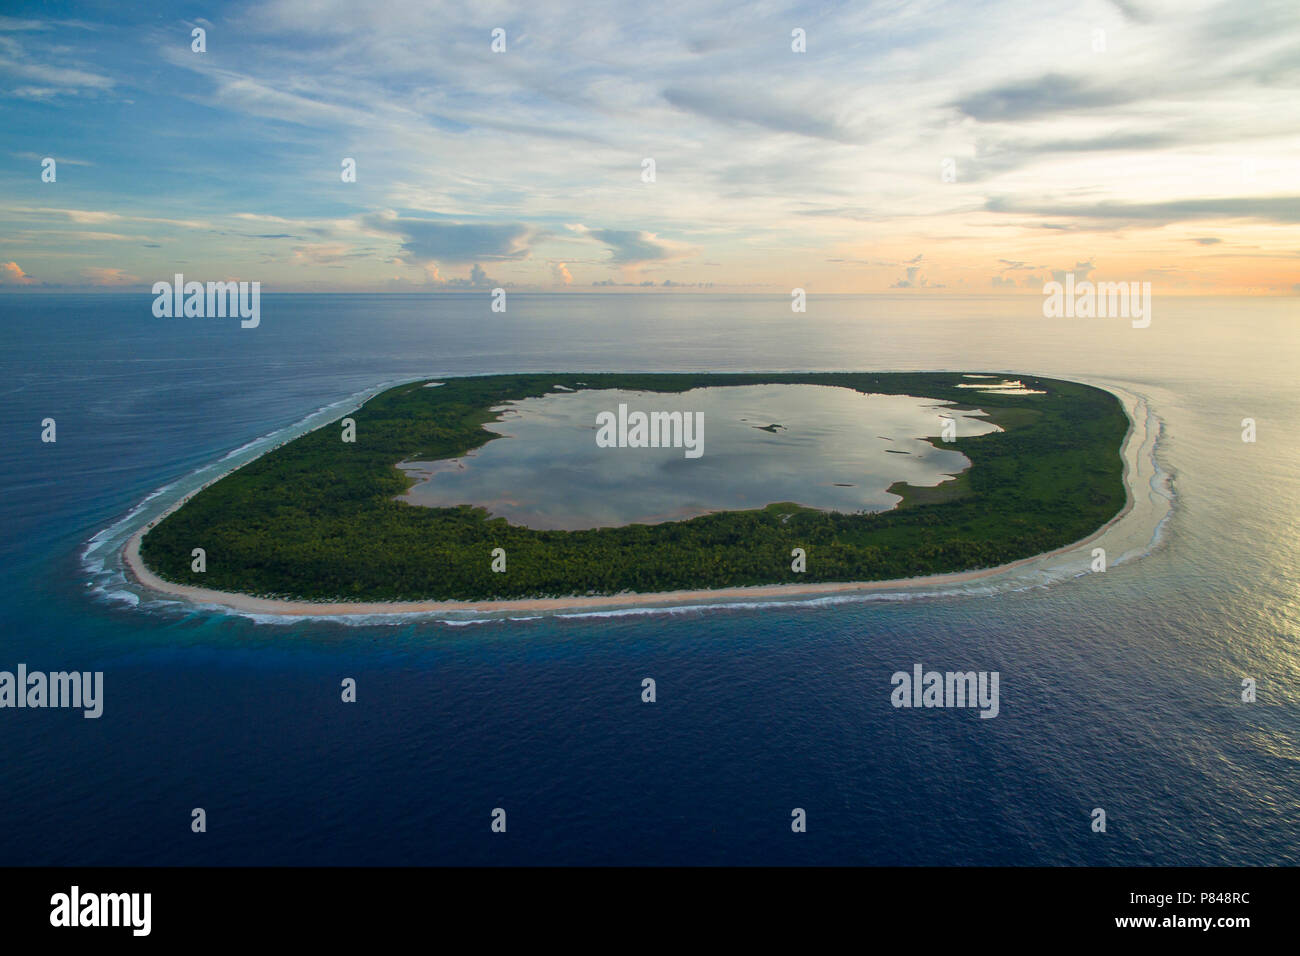 Aerial view of Manra Island, Phoenix Islands, Kiribati - Stock Image